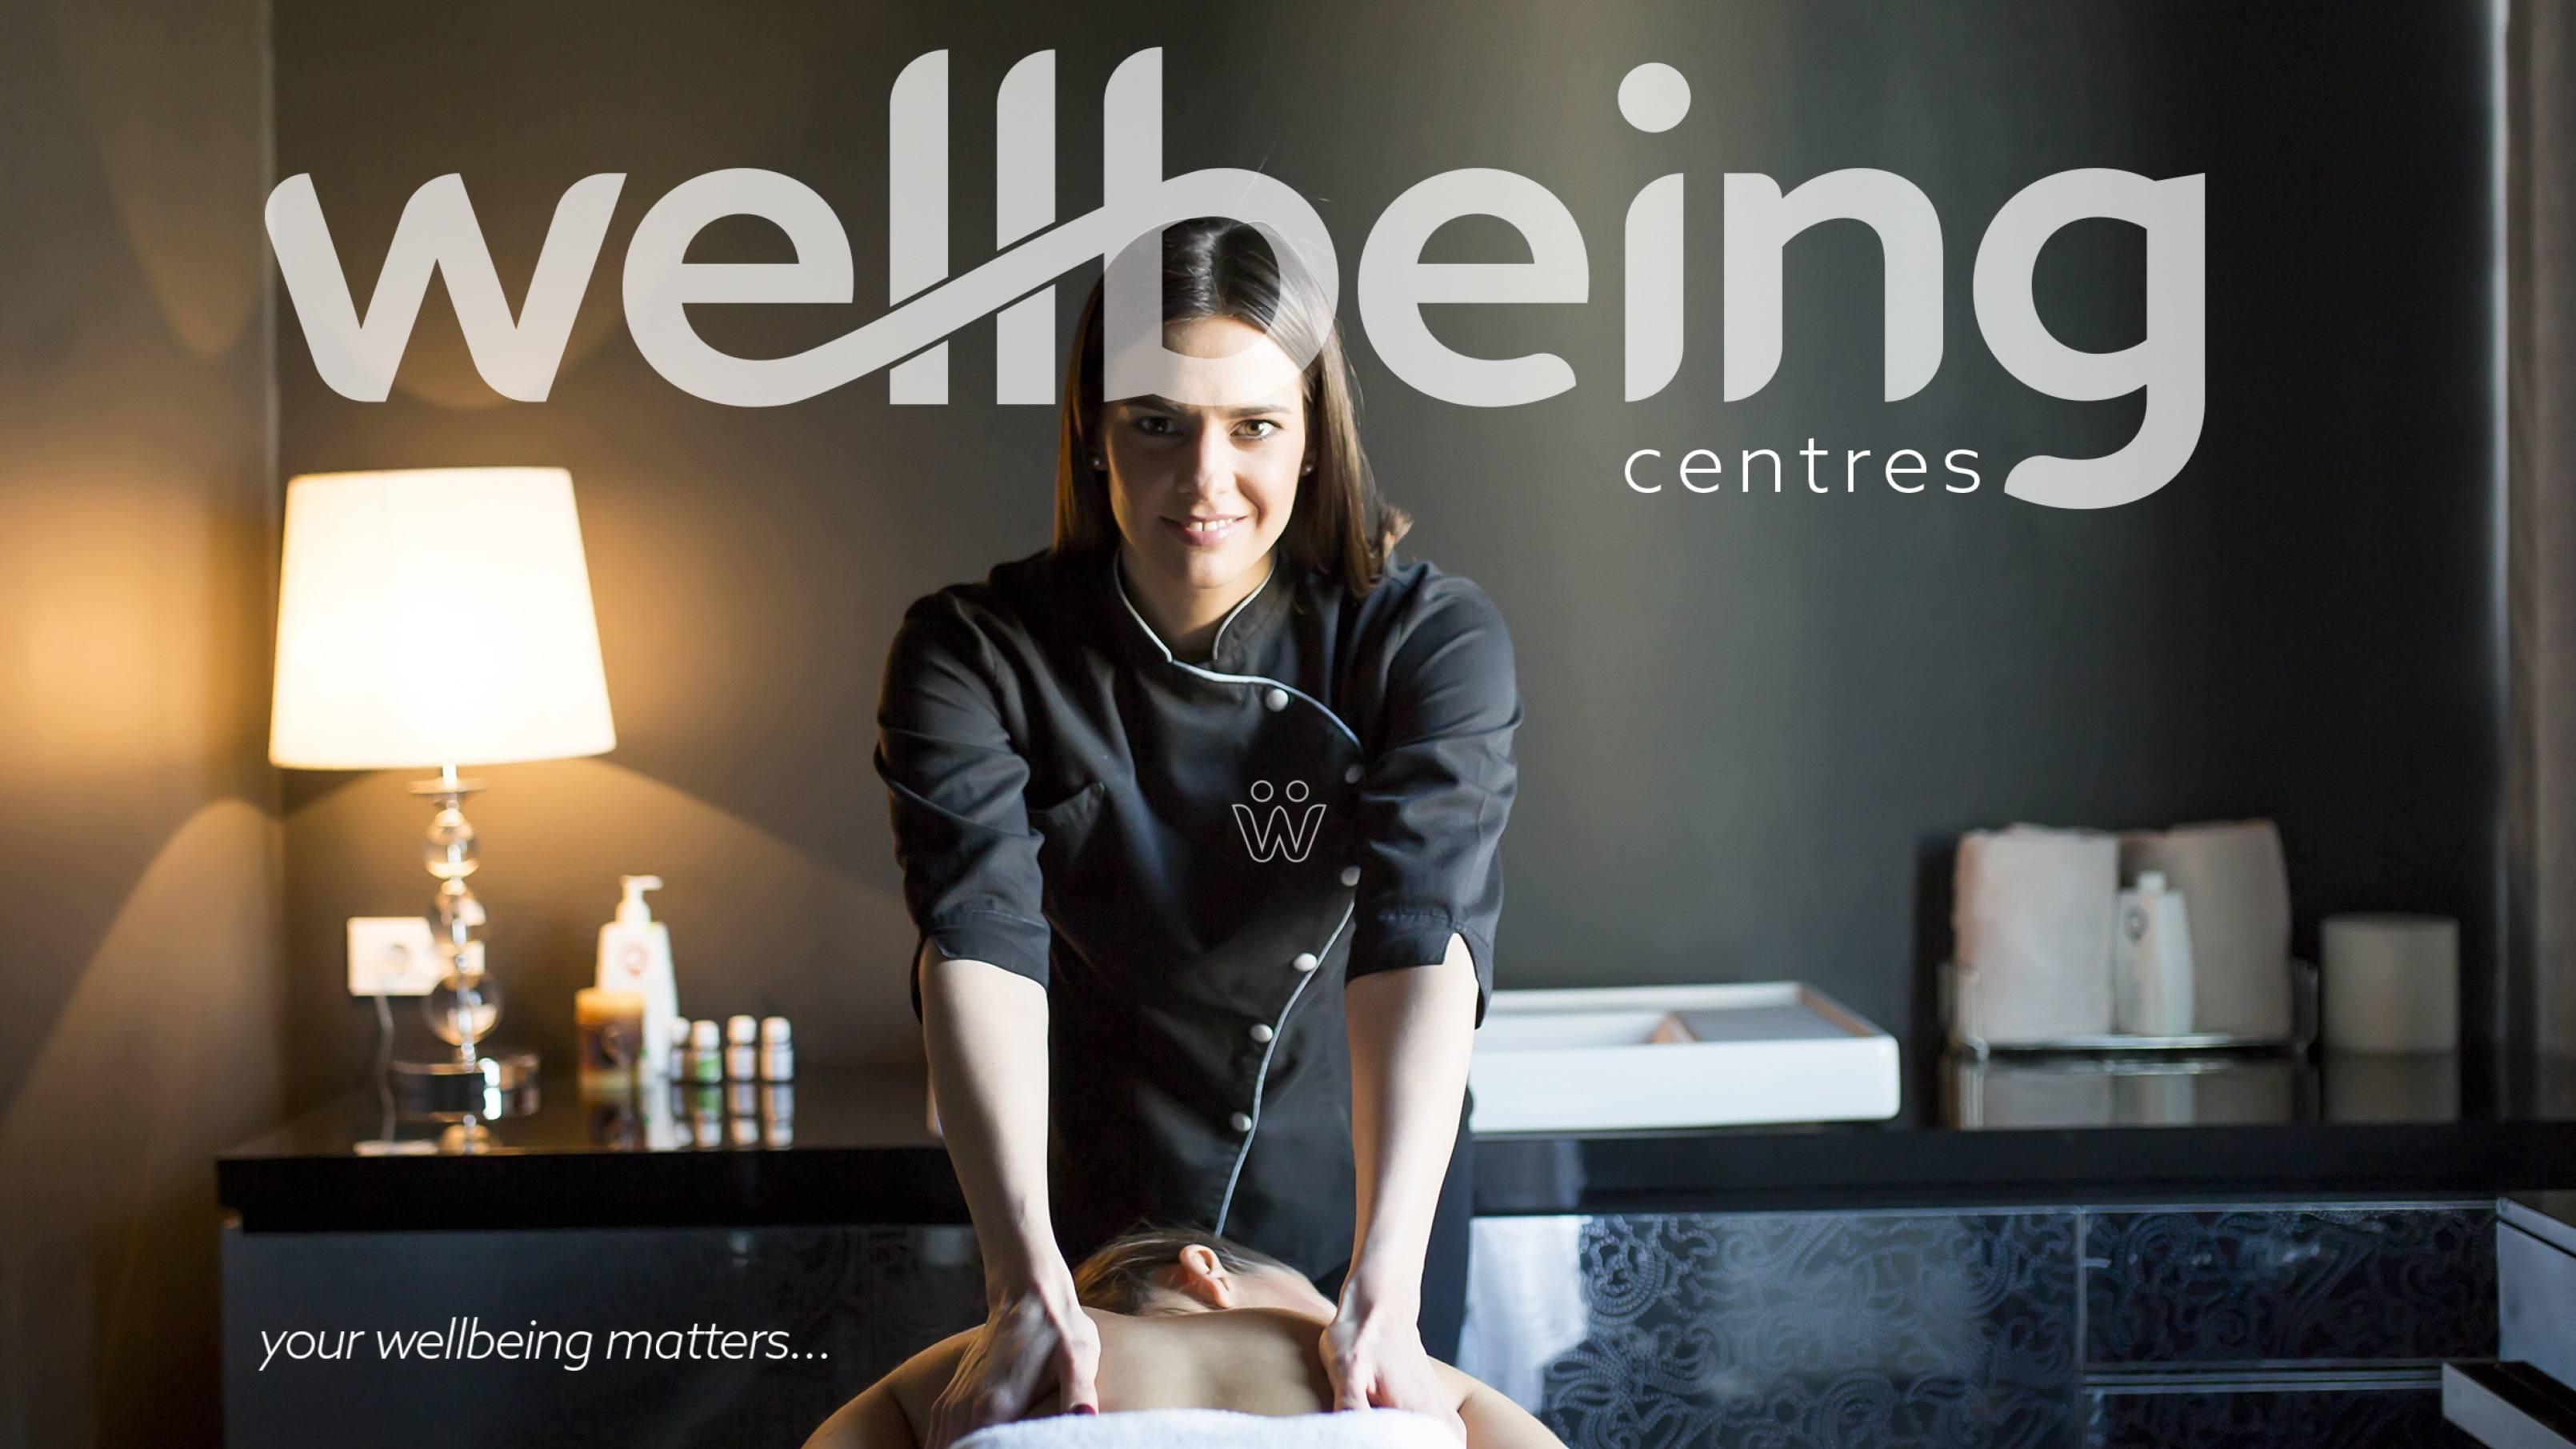 wellbeing_centres_banner.jpg